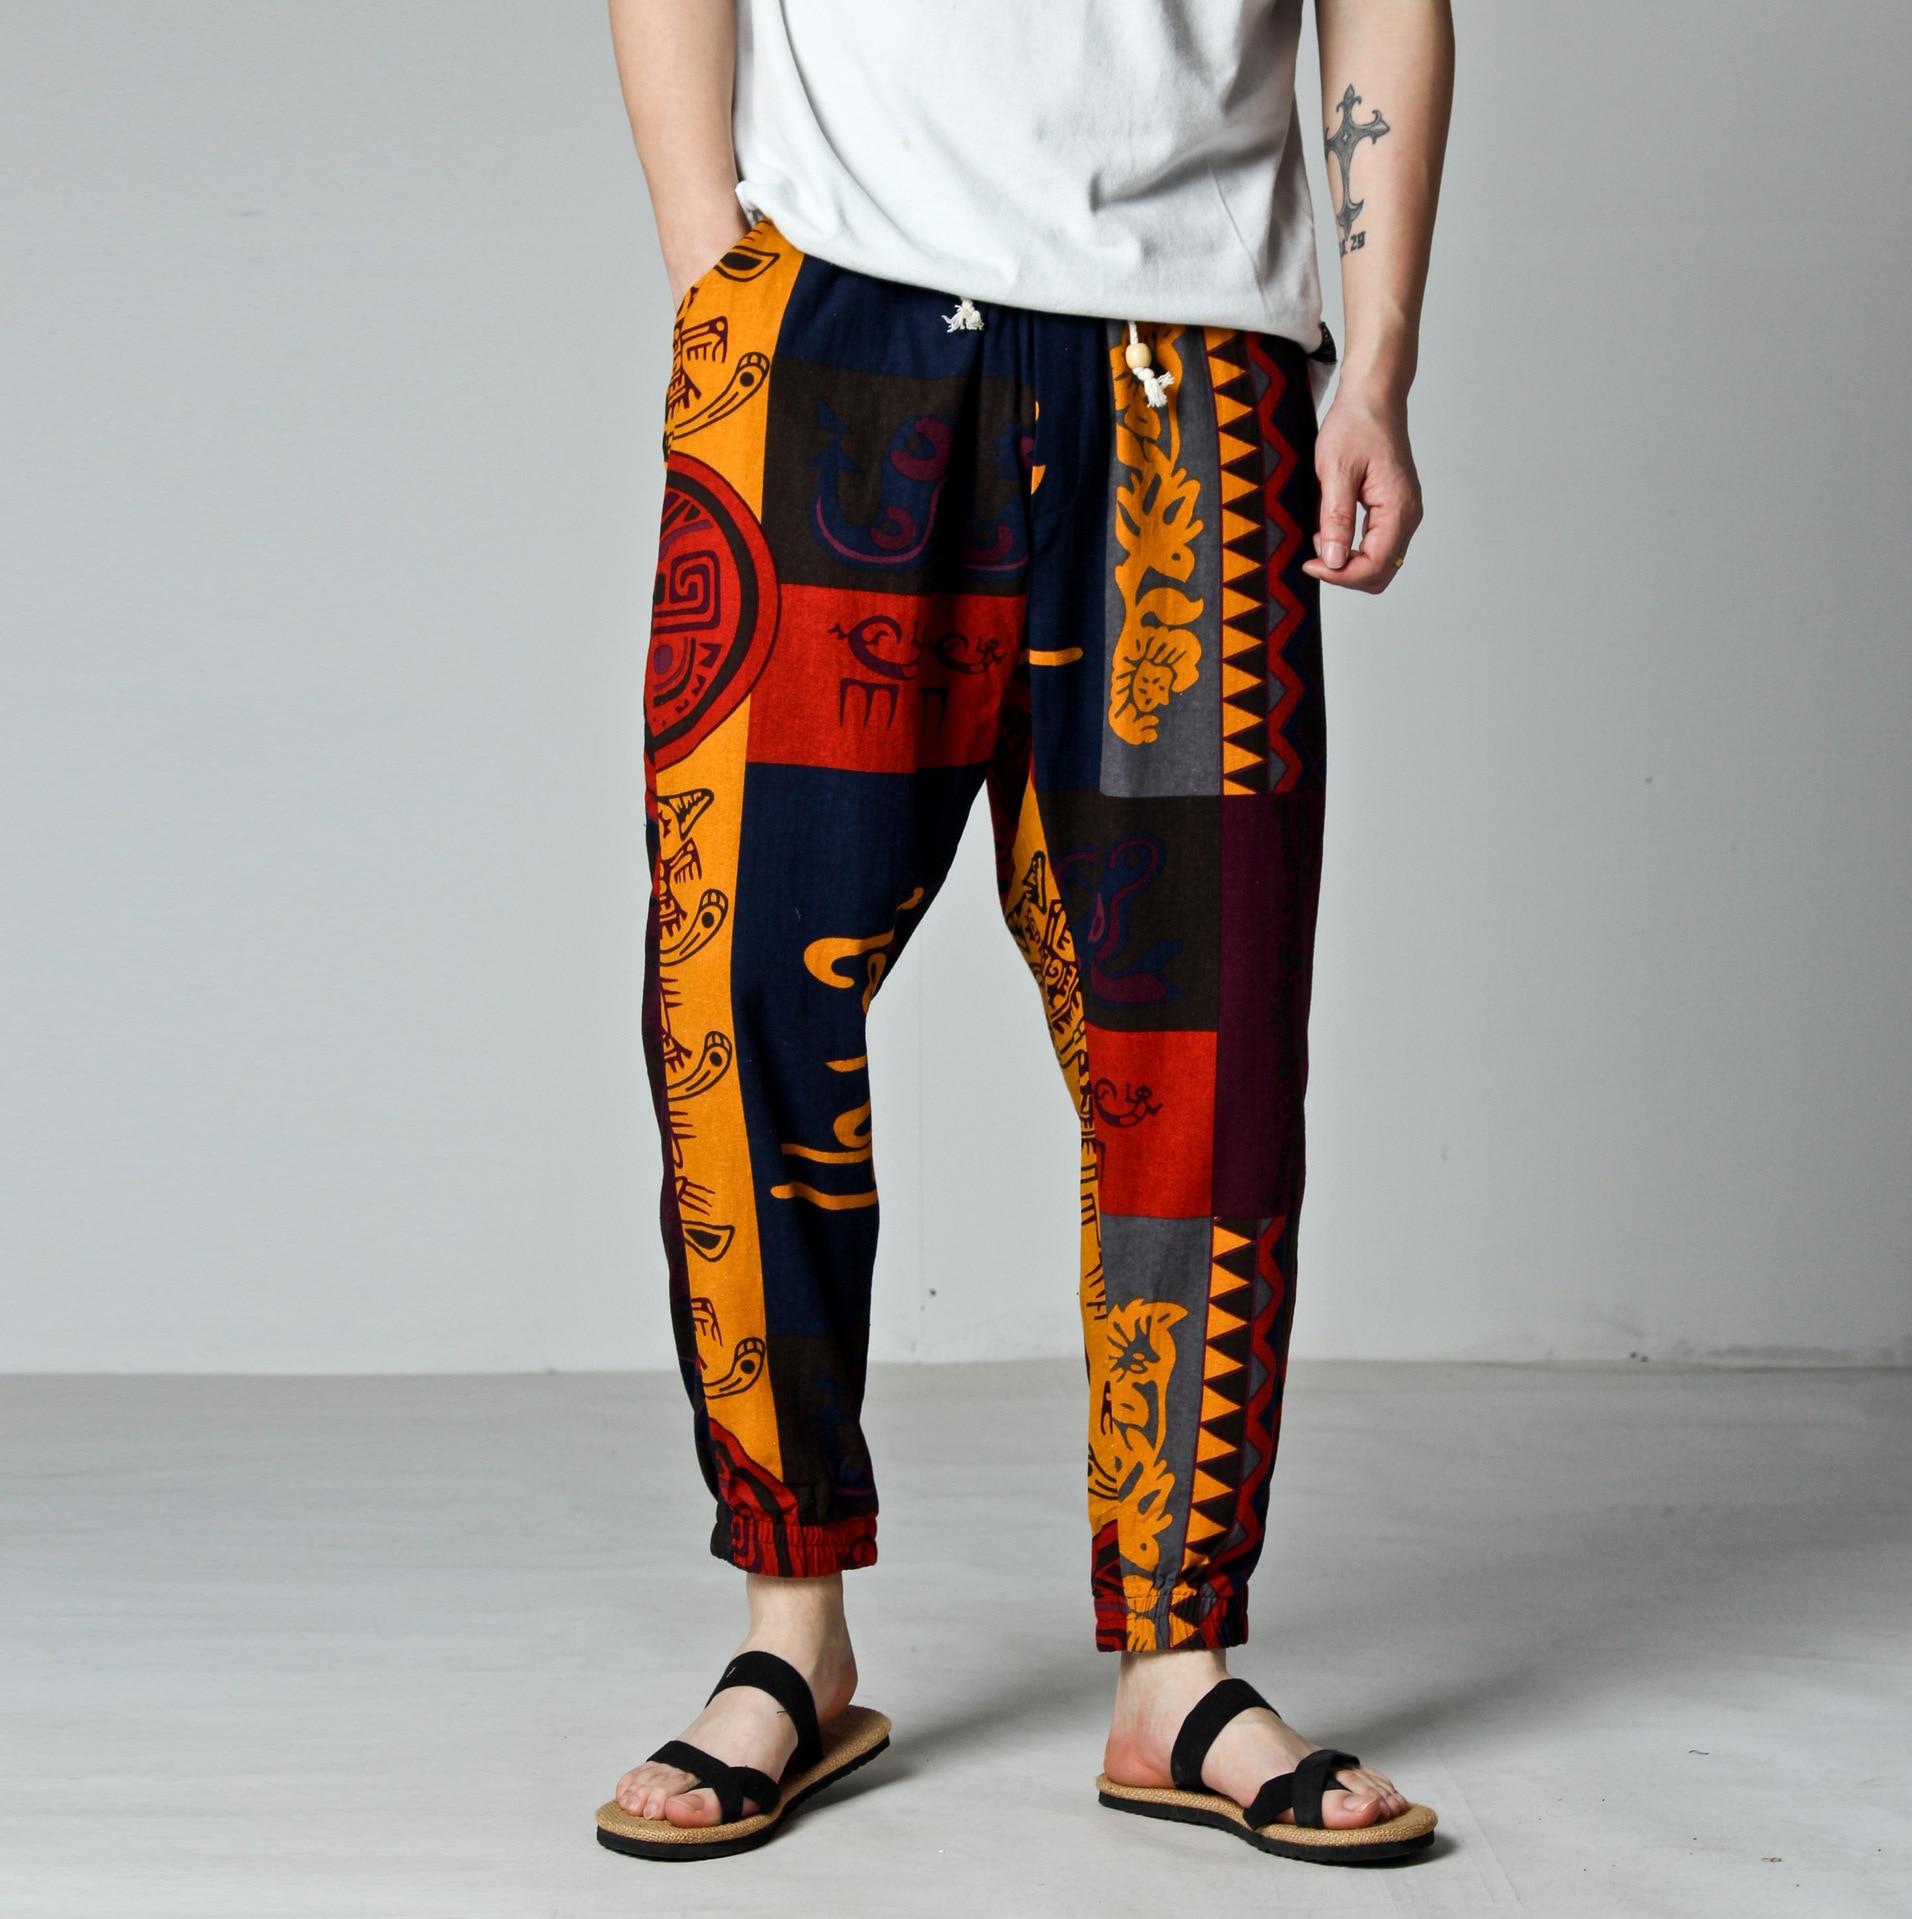 Export Southeast Asia Chinese-style Flax Casual 9 Pants Men Loose Harem Pants Large Size Capri Pants Men's